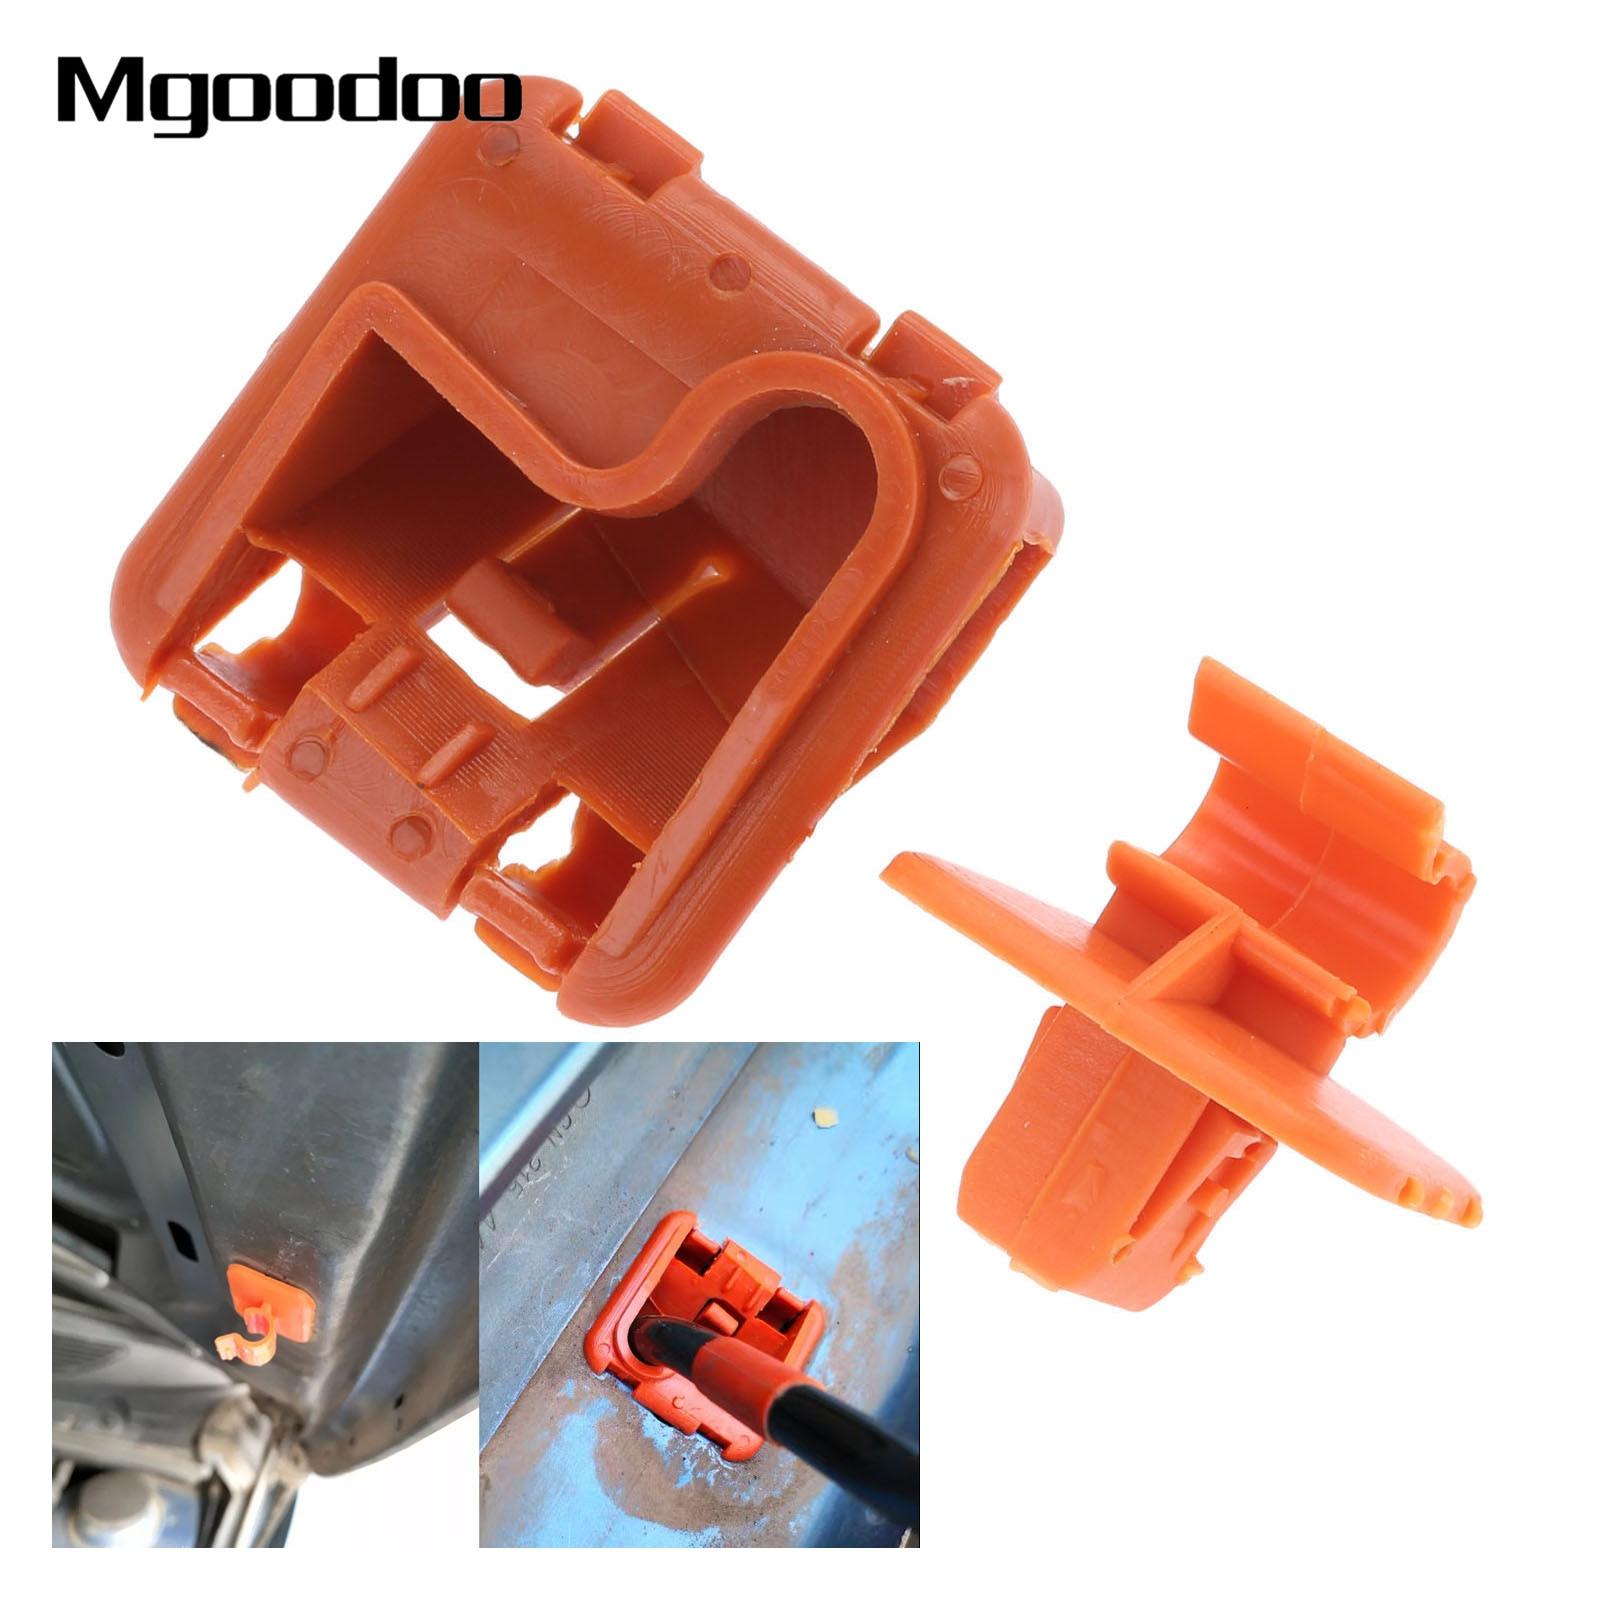 Hood Bonnet Rod Stay Clip Holder 1U0823570A Fit For Skoda Fabia Octavia 2004-13